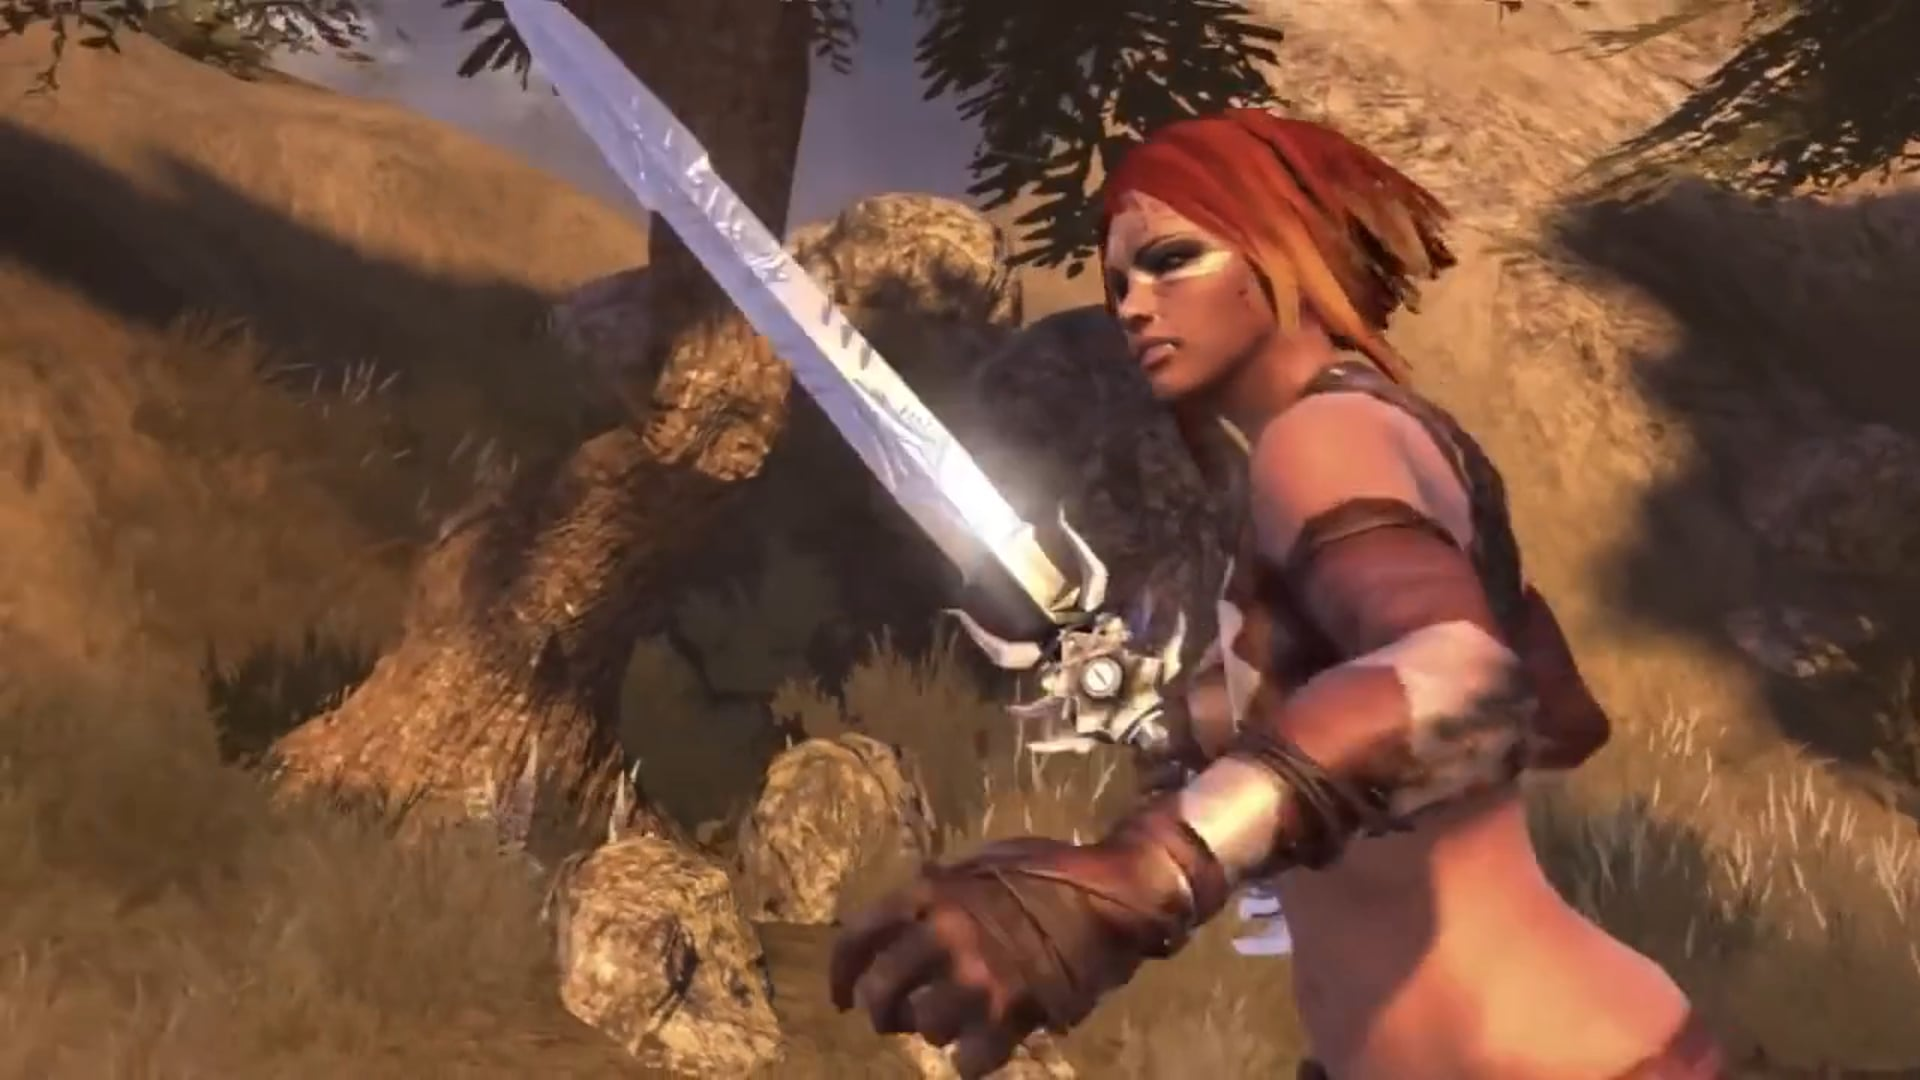 SEGA_GoldenAxe_Sound Designer_fantasy_videogame_DragonflySound